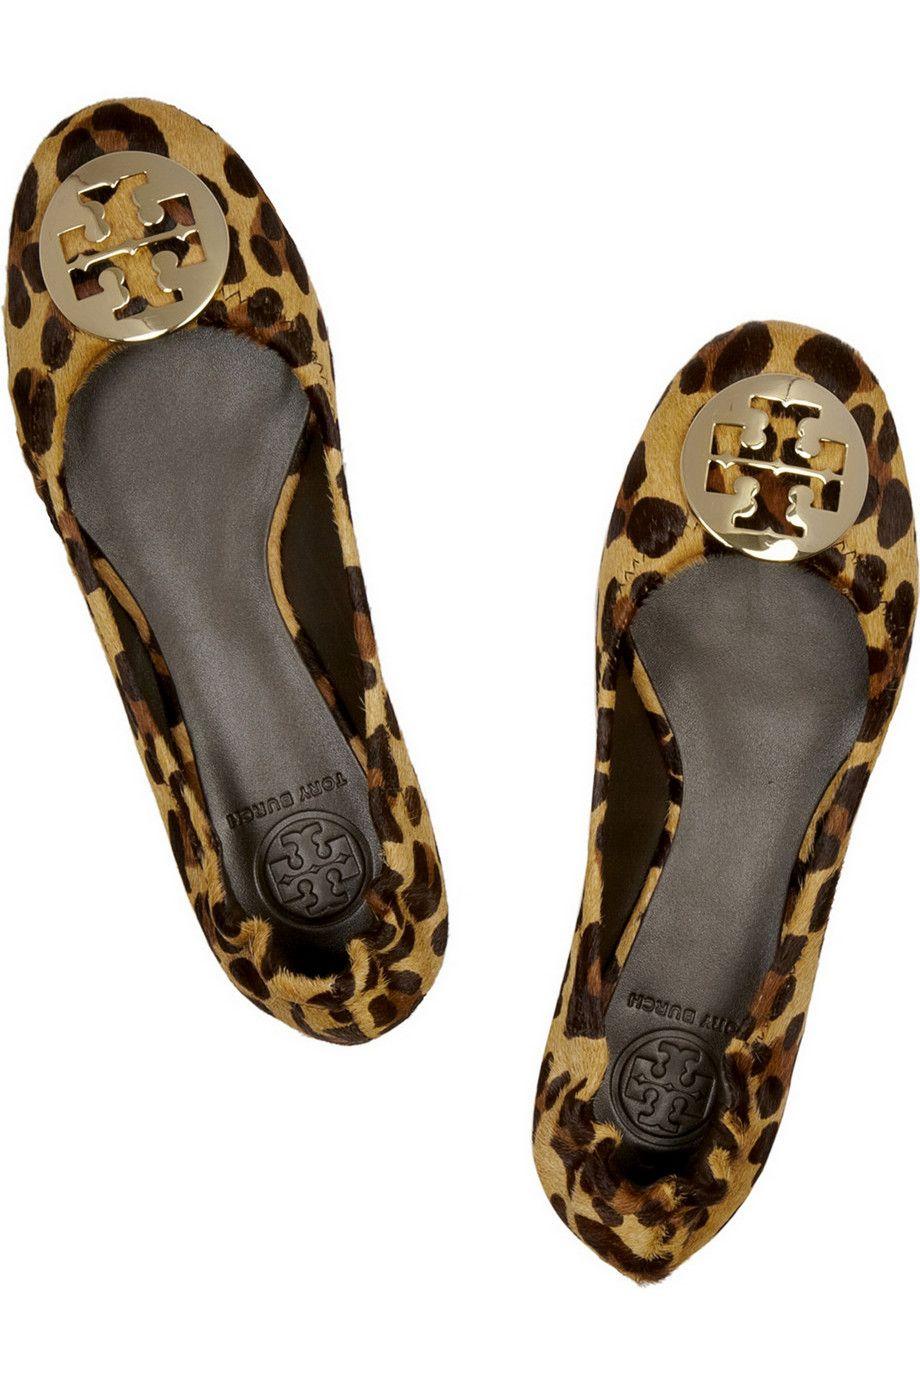 8632e46a59ff ... low price tory burch reva leopard print calf hair ballet flats net a  af12f 4dd7c